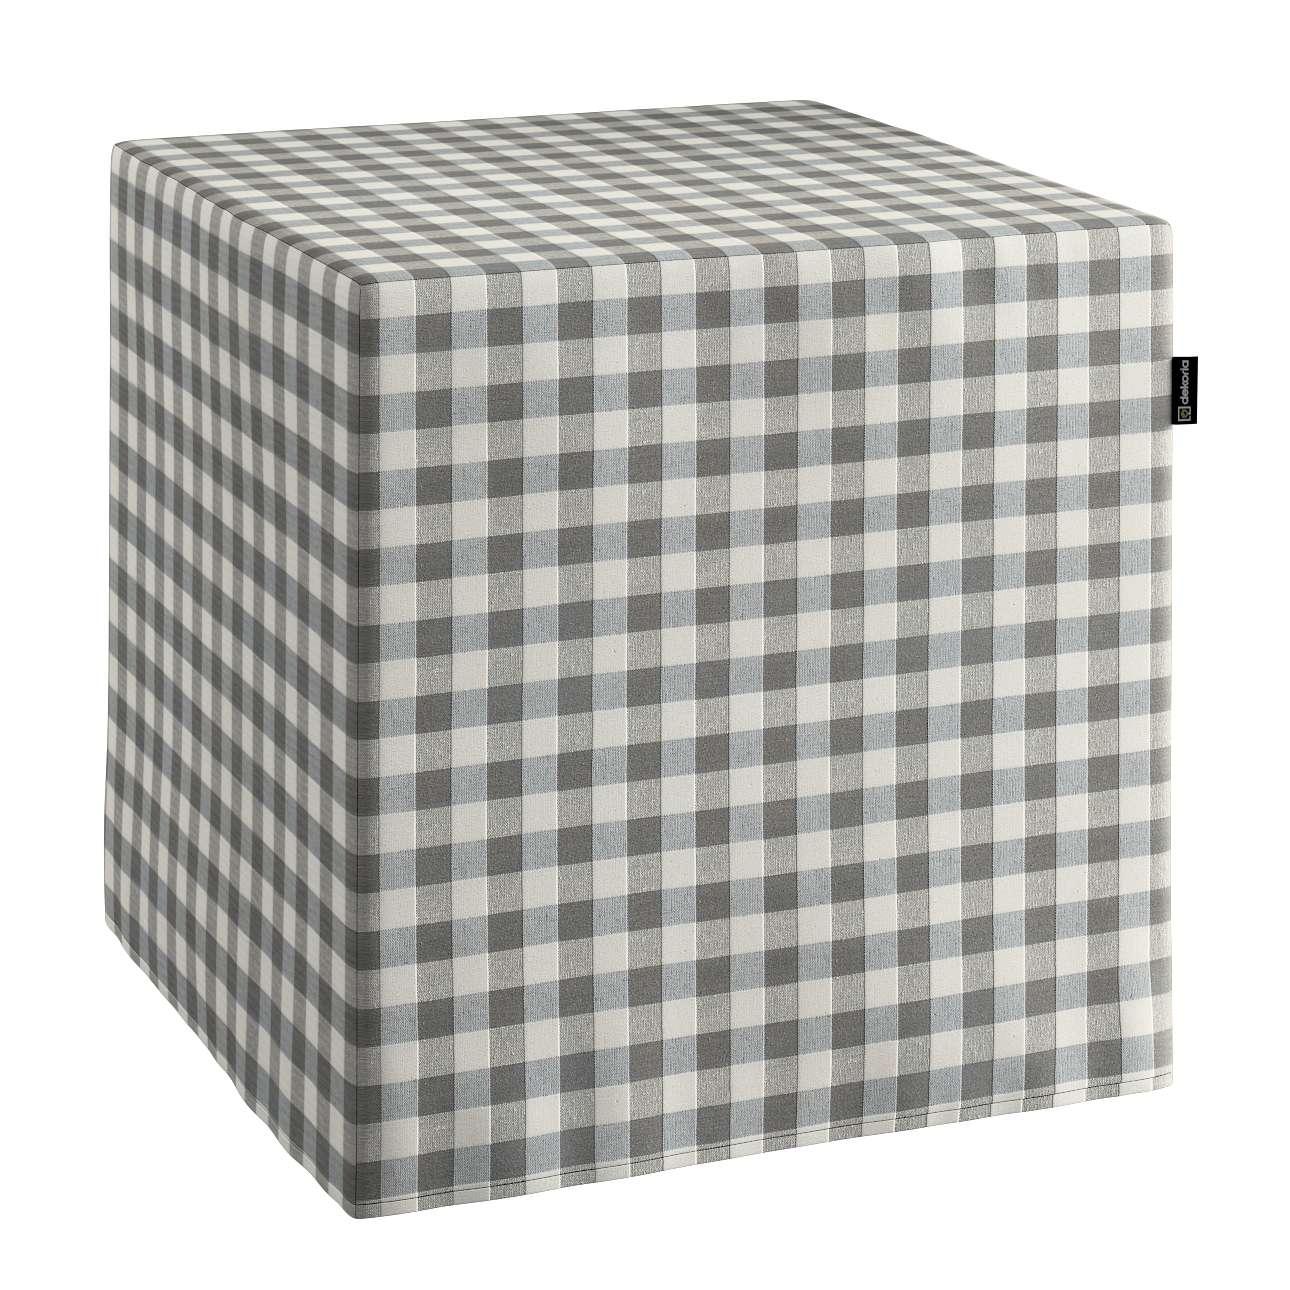 Harter Sitzwürfel, grau-ecru , 40 x 40 x 40 cm, Quadro | Wohnzimmer > Hocker & Poufs > Sitzwürfel | Dekoria